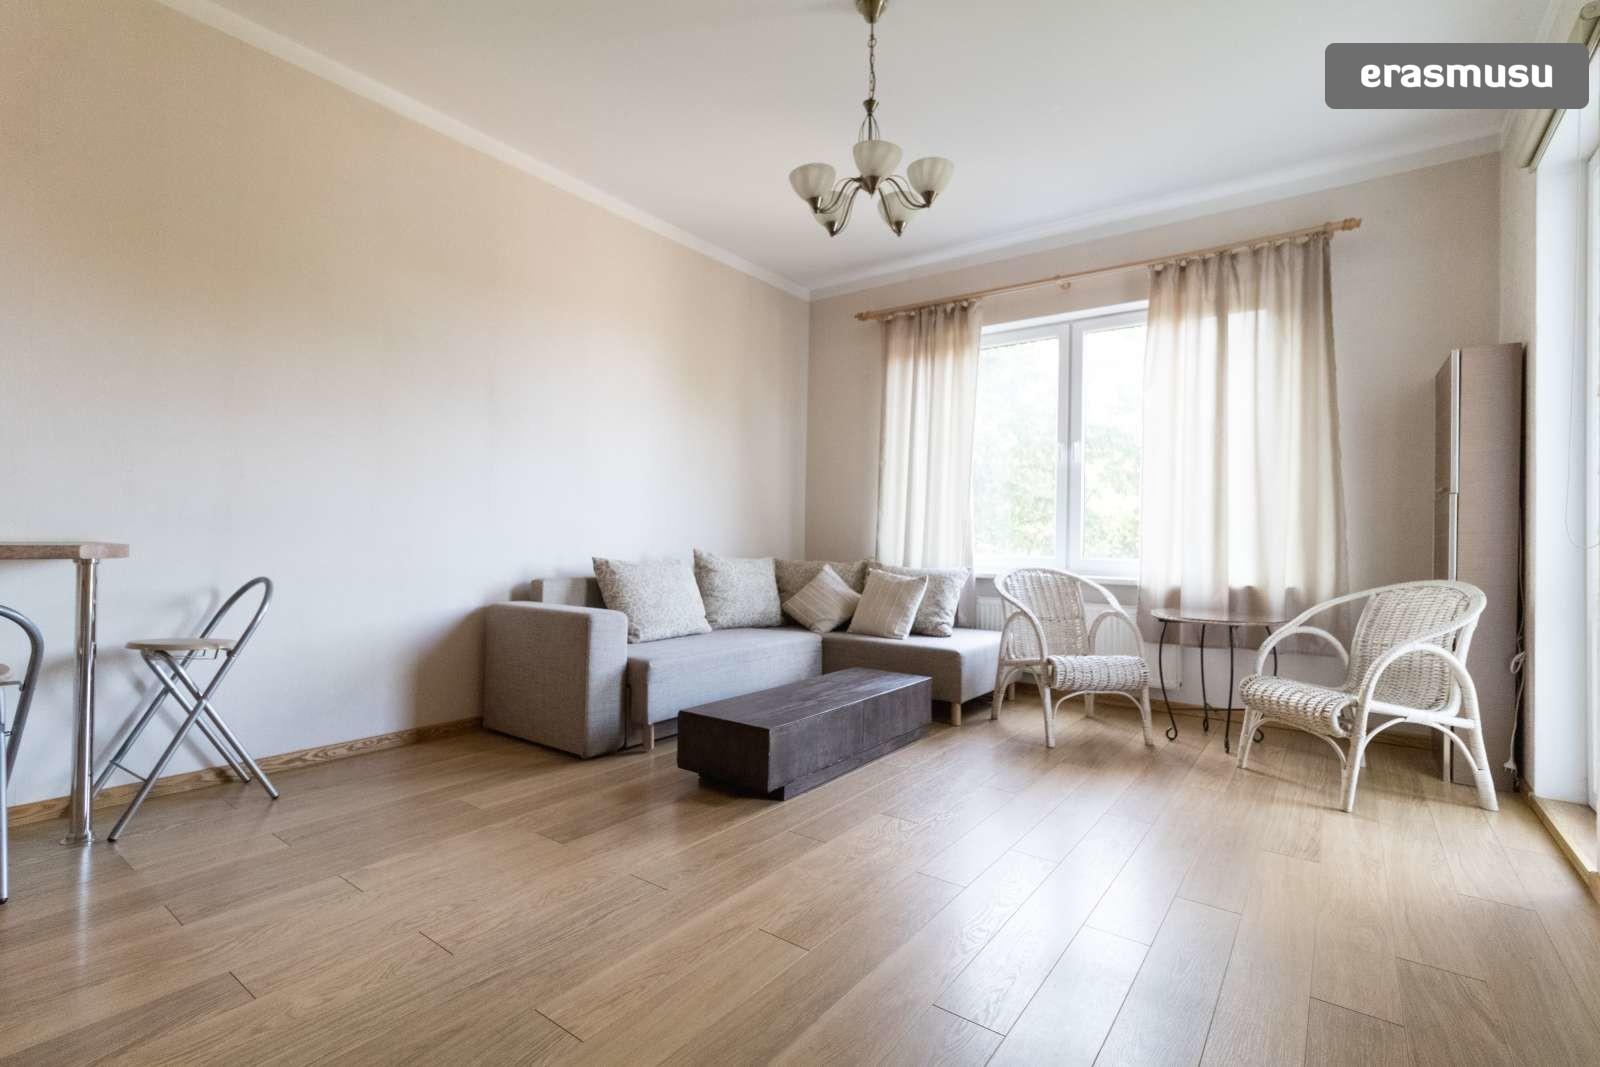 stylish-1-bedroom-apartment-balcony-rent-zasulauks-1ee7914e068b3